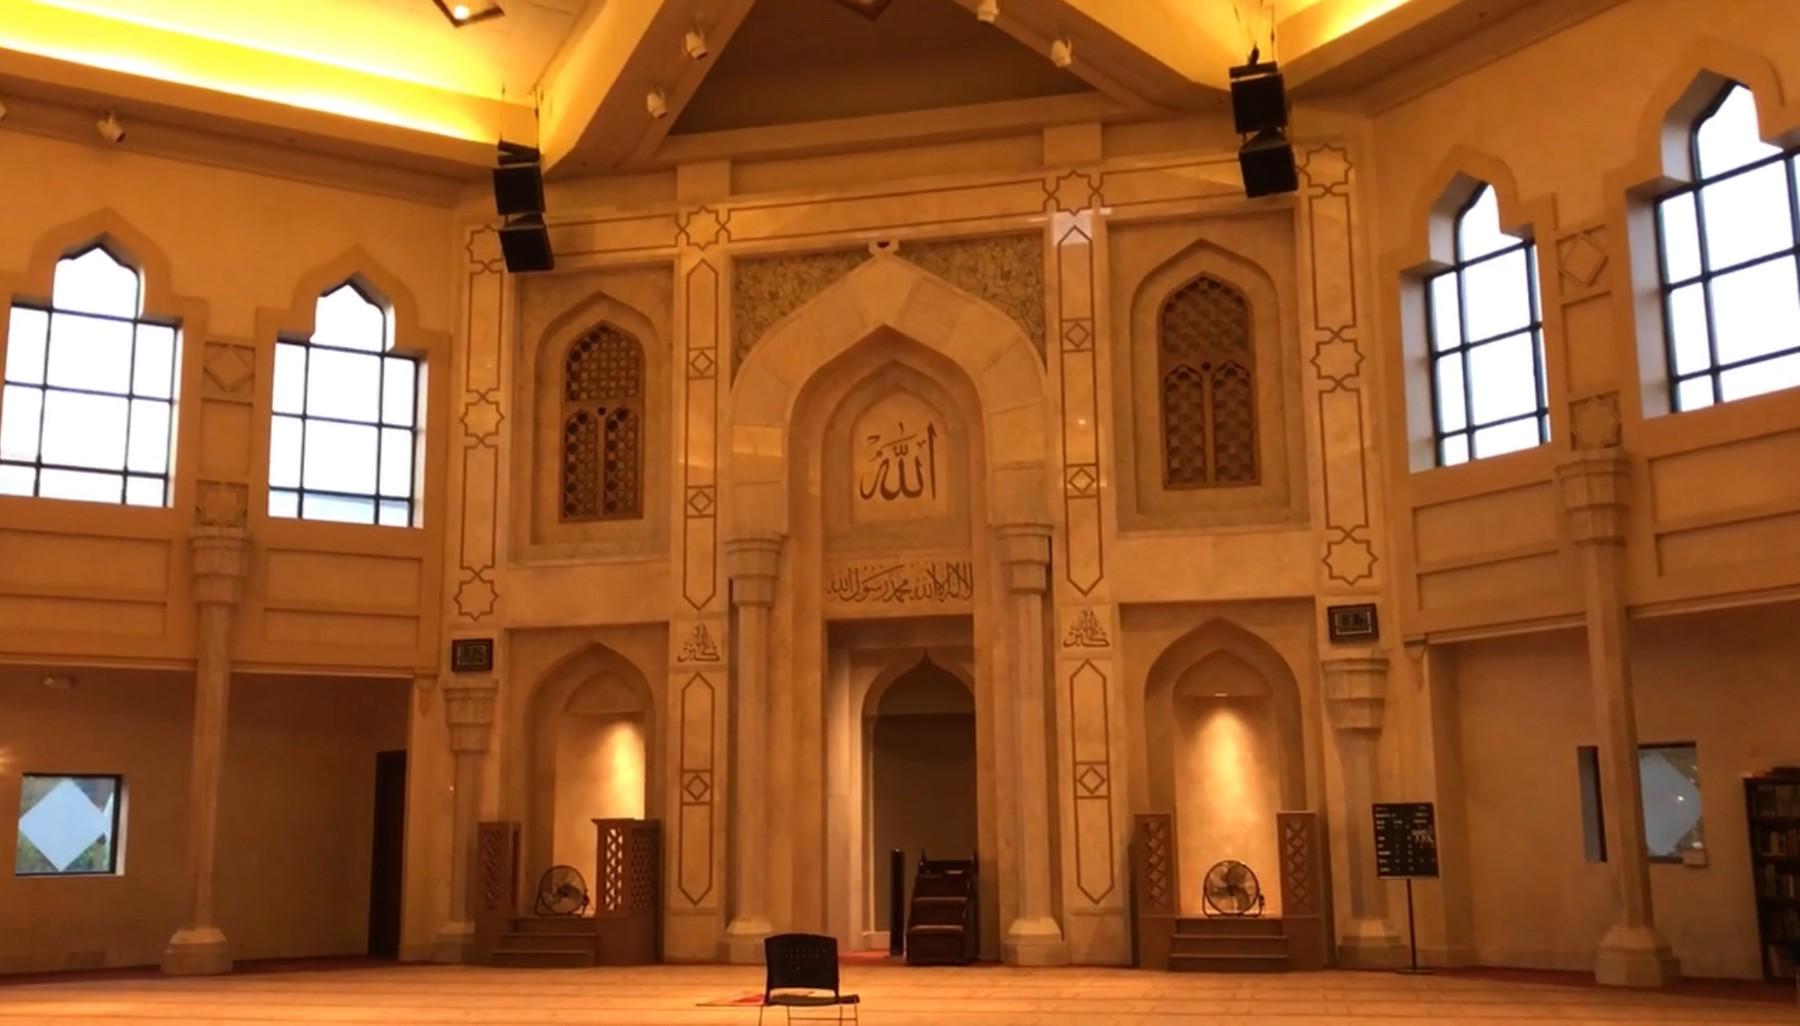 al-farooq-masjid-atlanta.jpg